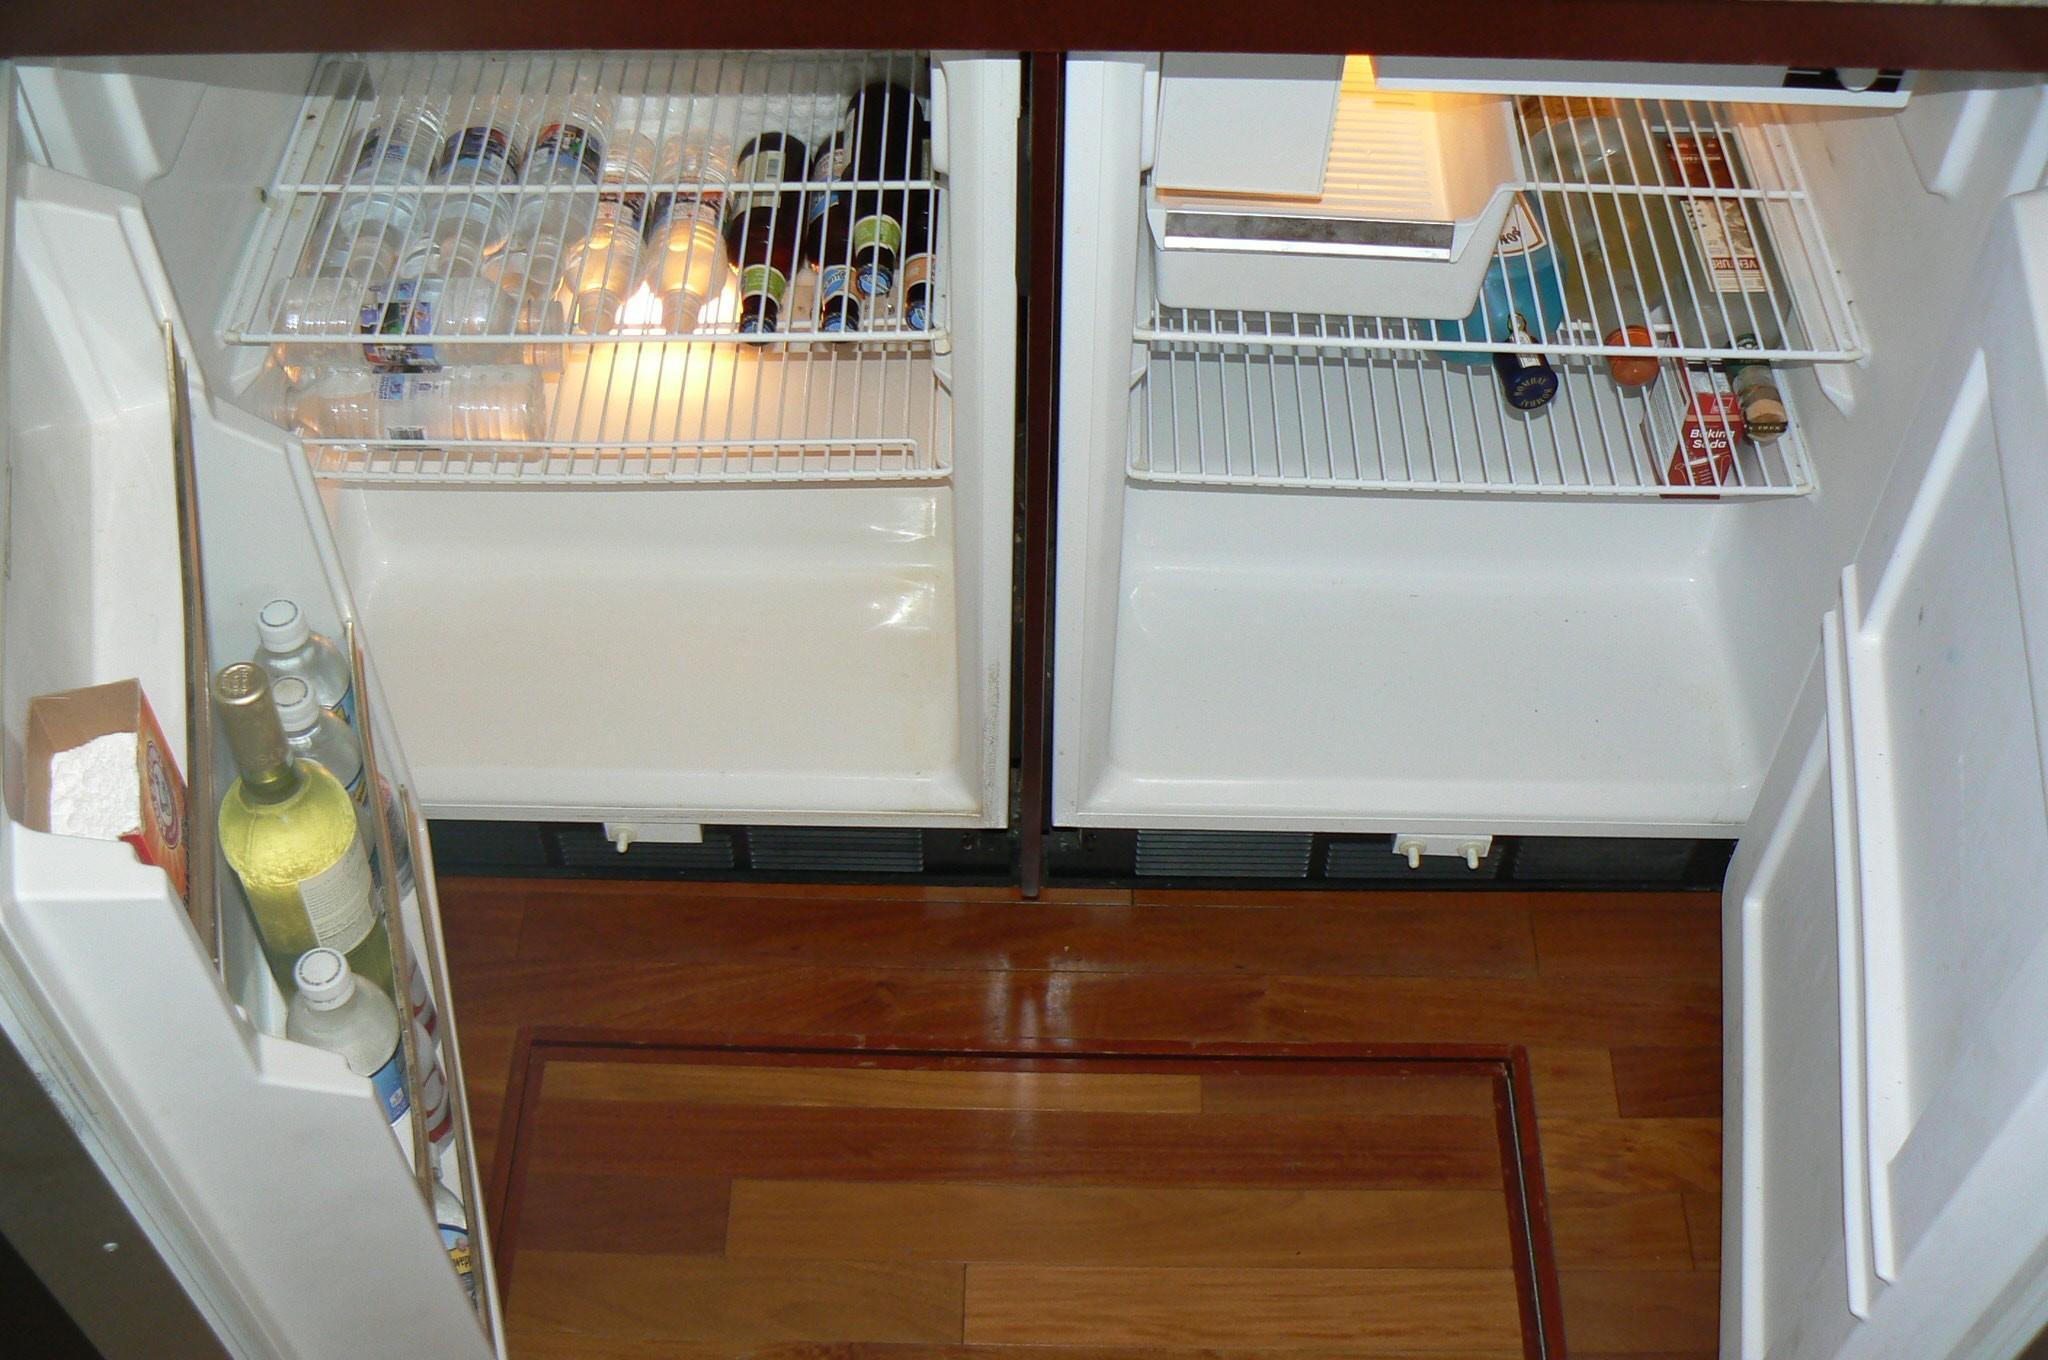 Refrigerator / Freezer 2